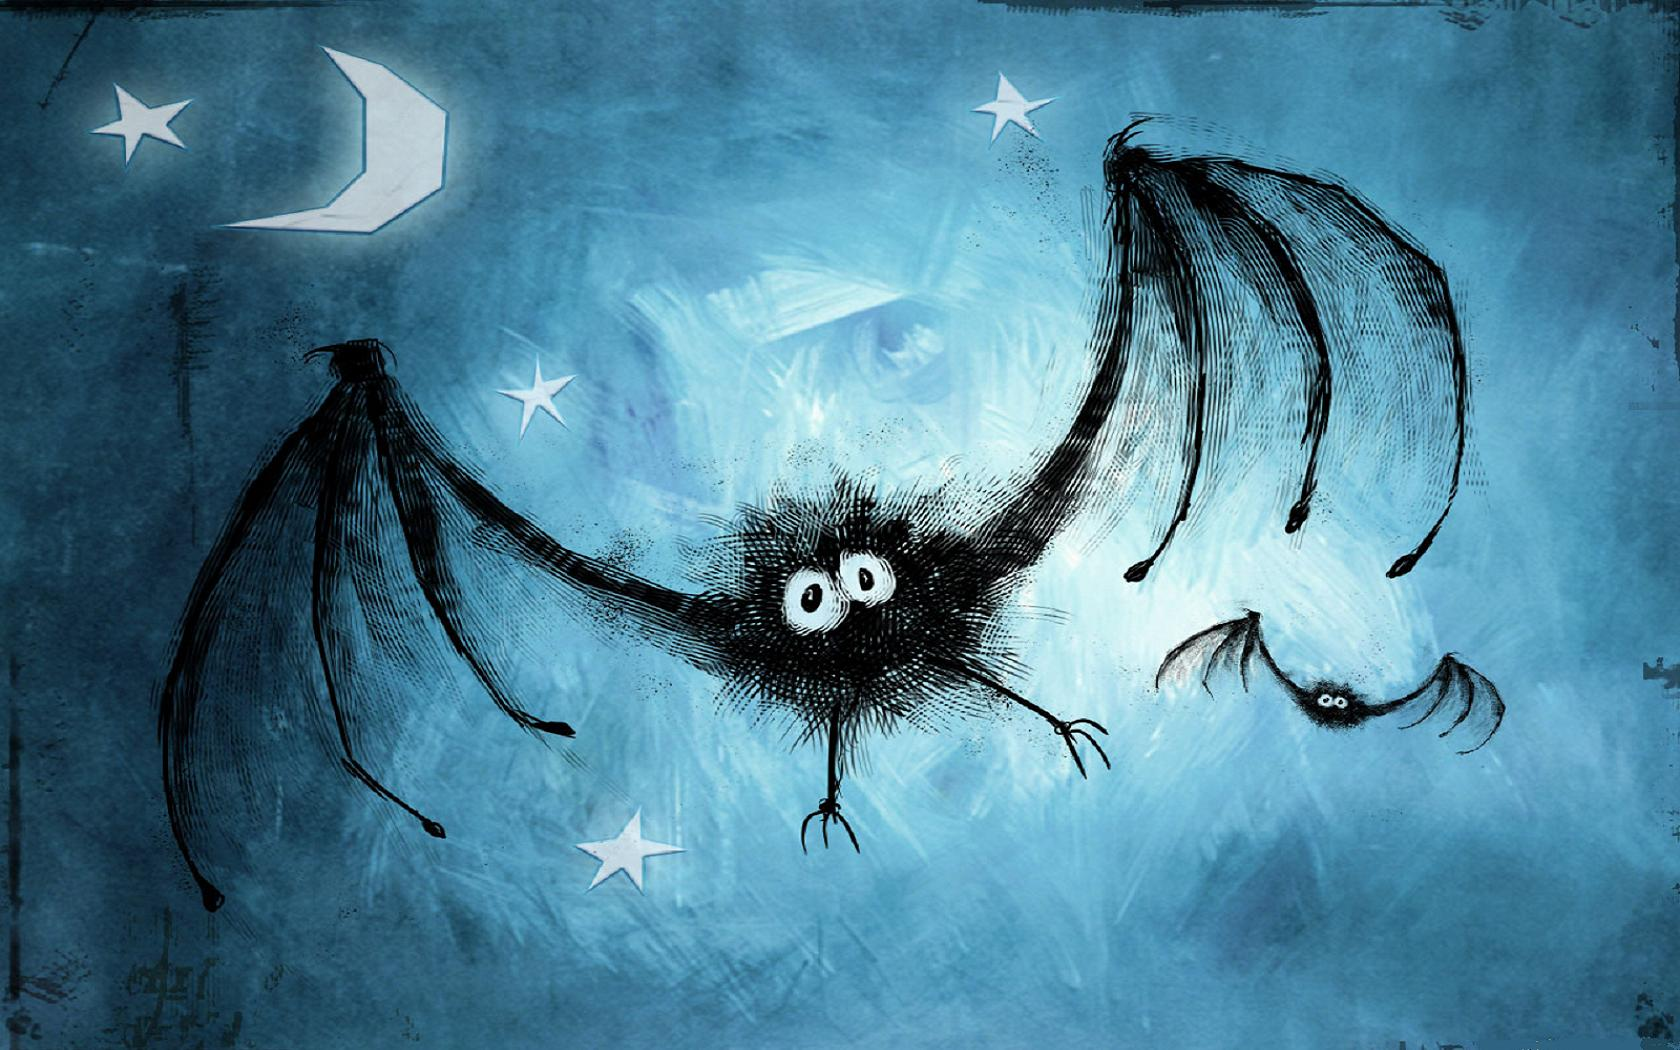 Dibujo de murcielagos - 1680x1050